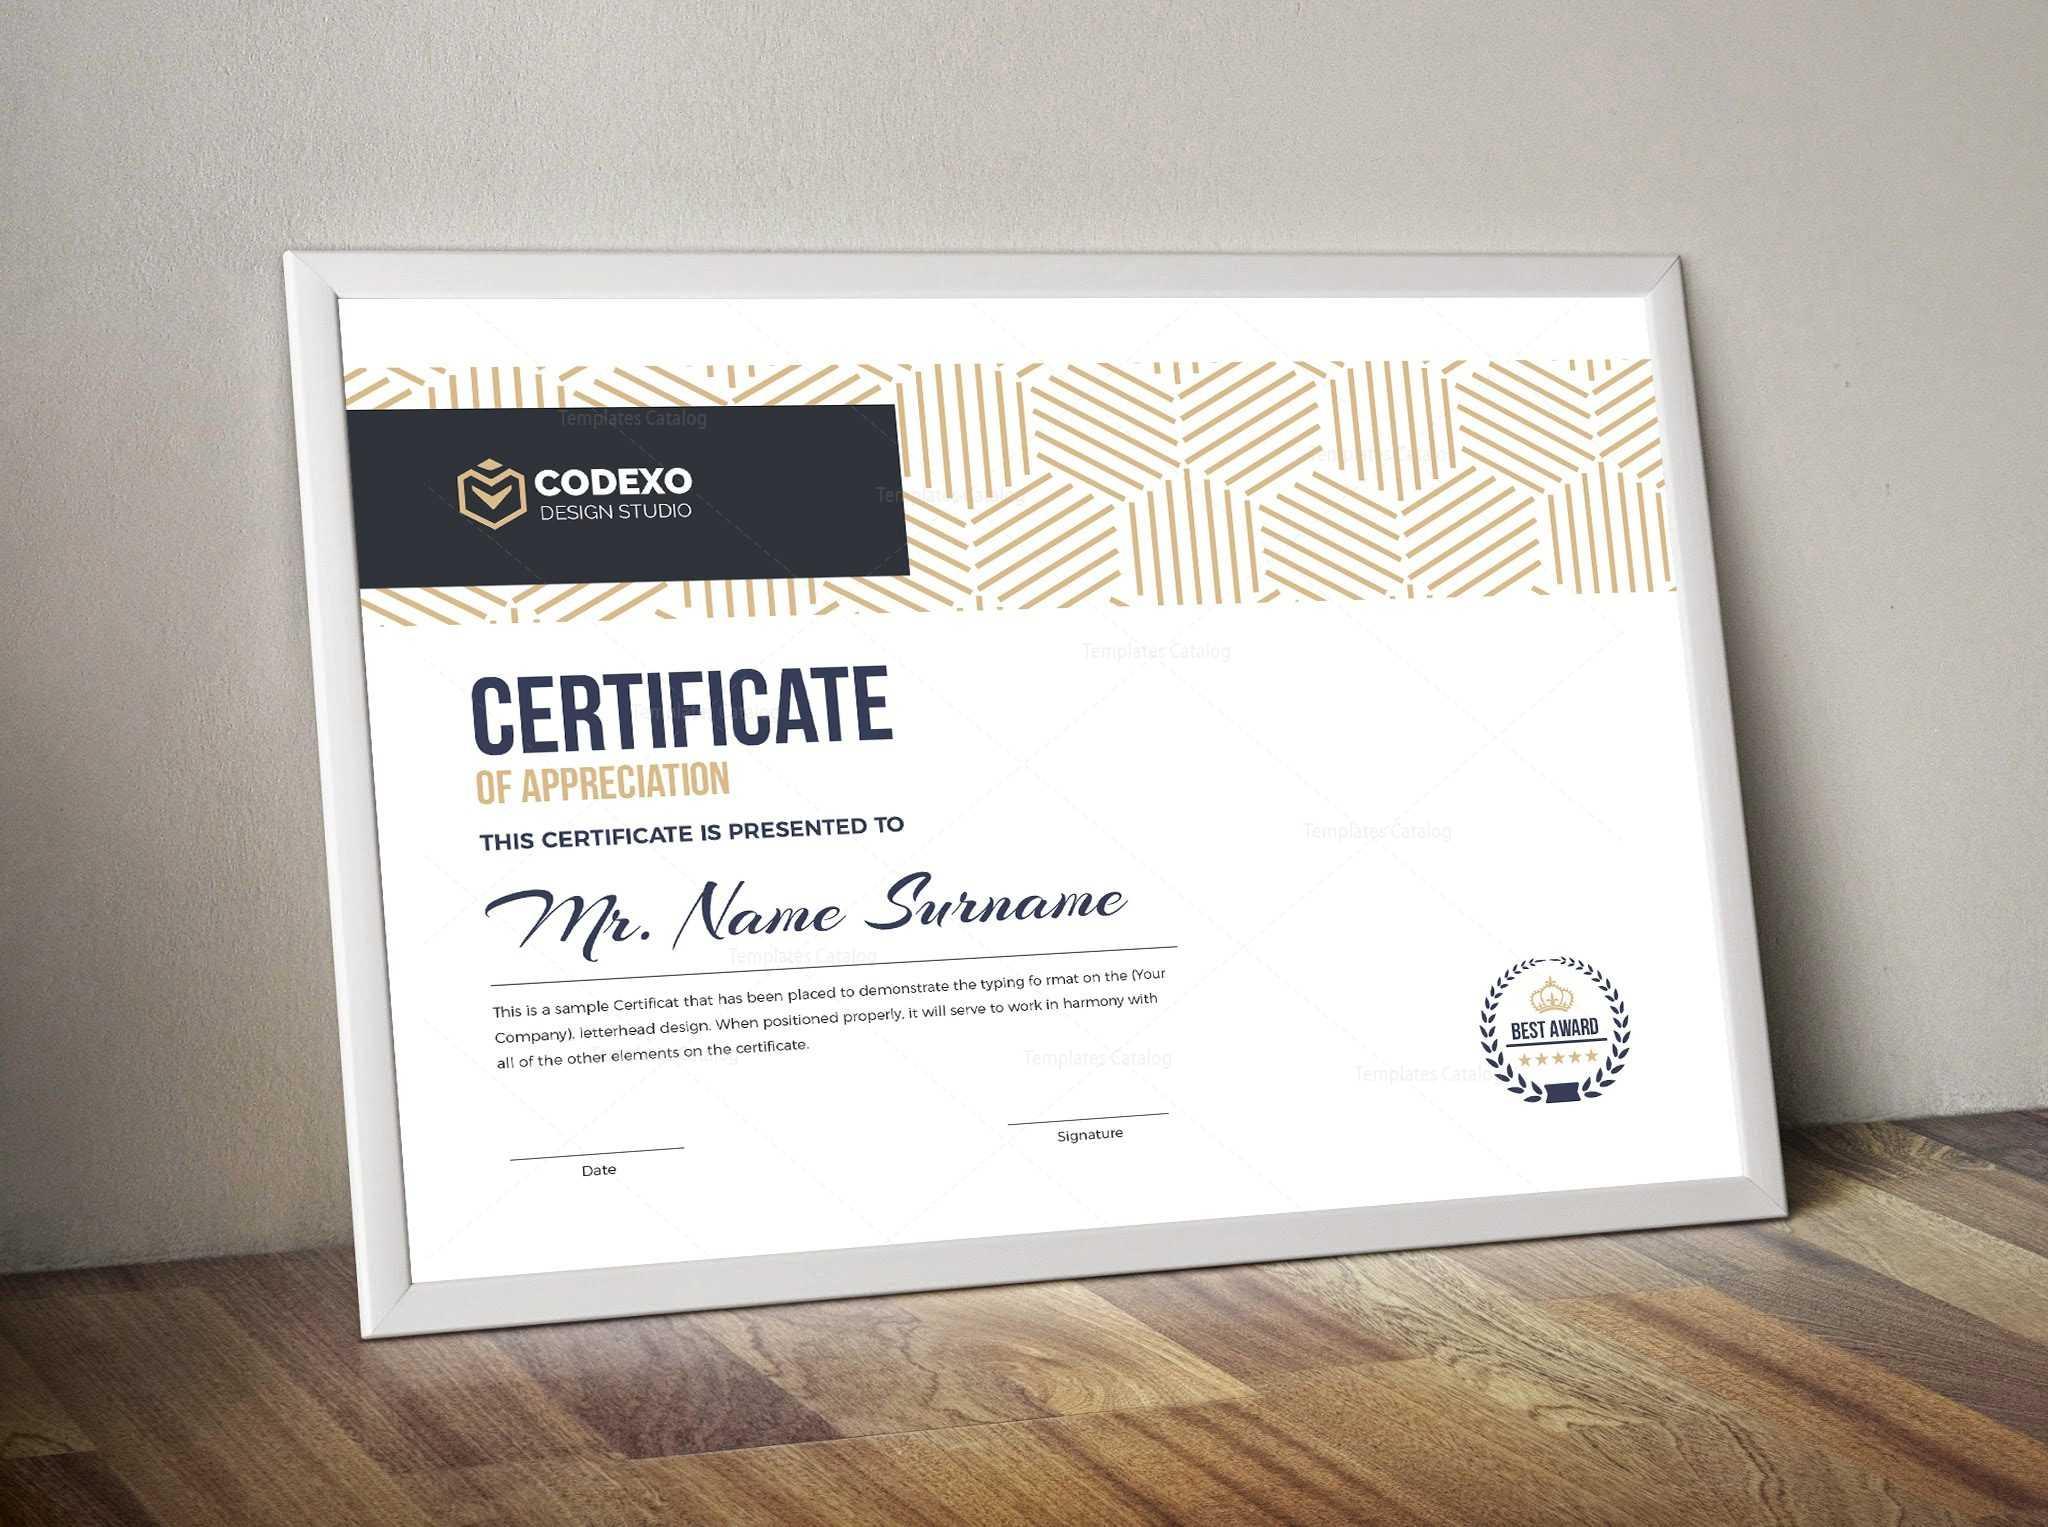 Demeter Professional Landscape Certificate Template 000844 Within Landscape Certificate Templates